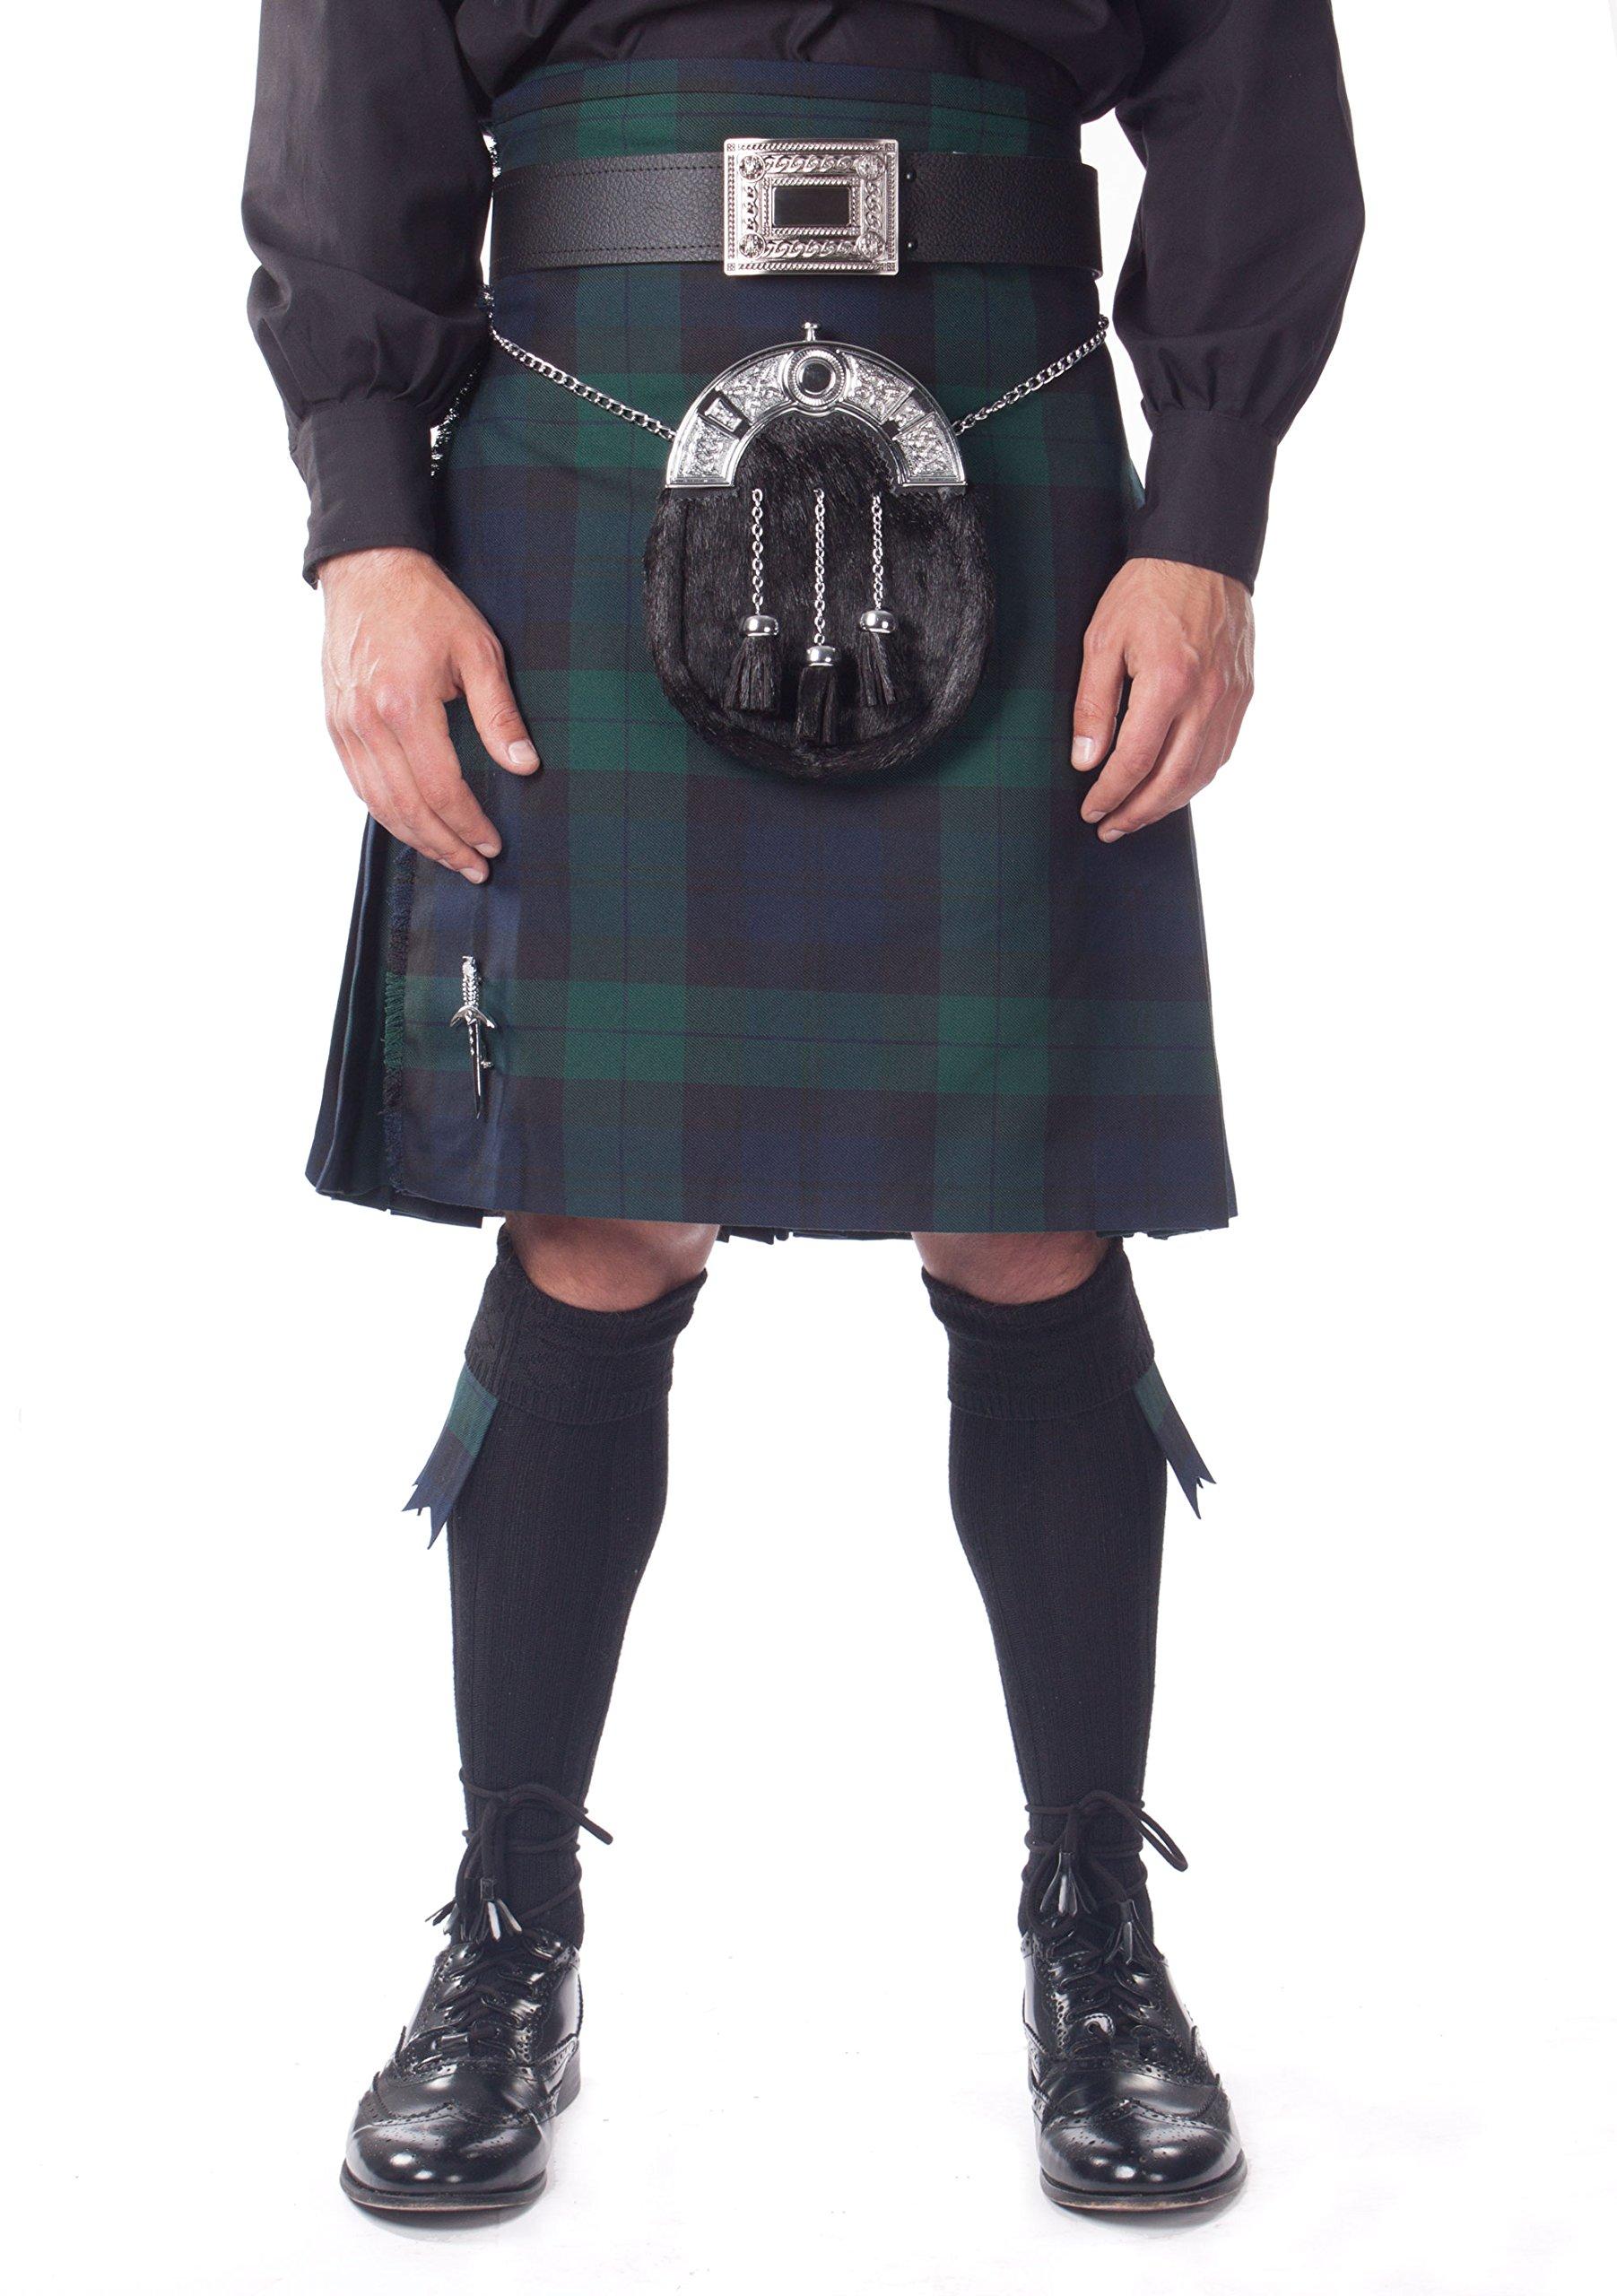 Kilt Society Mens 7 Piece Full Dress Kilt Outfit- Black Watch Tartan with Black Hose 30'' to 34''